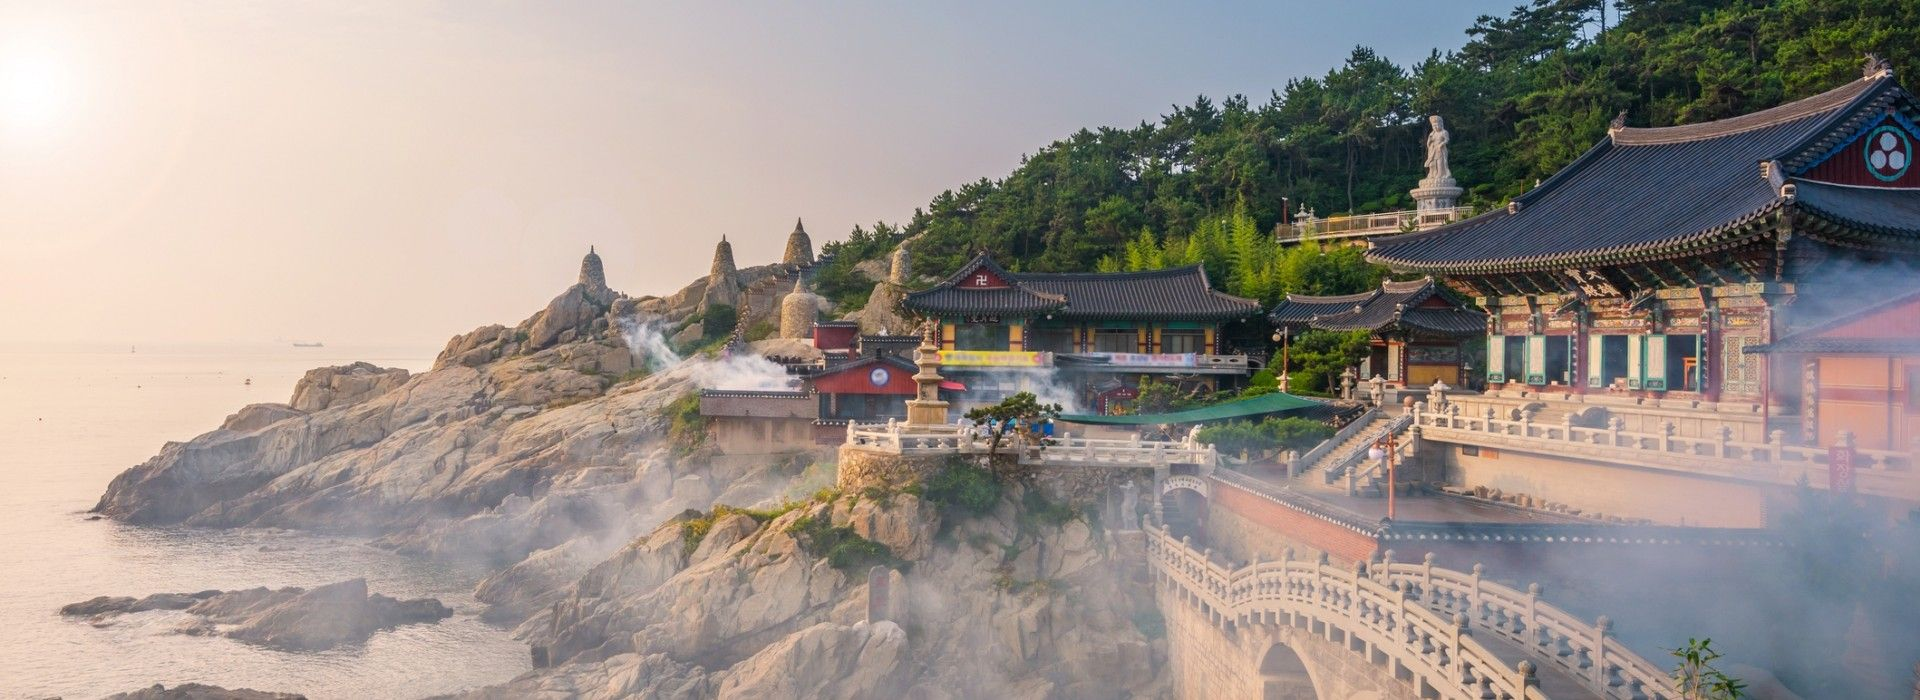 Natural landmarks sightseeing Tours in Seoul